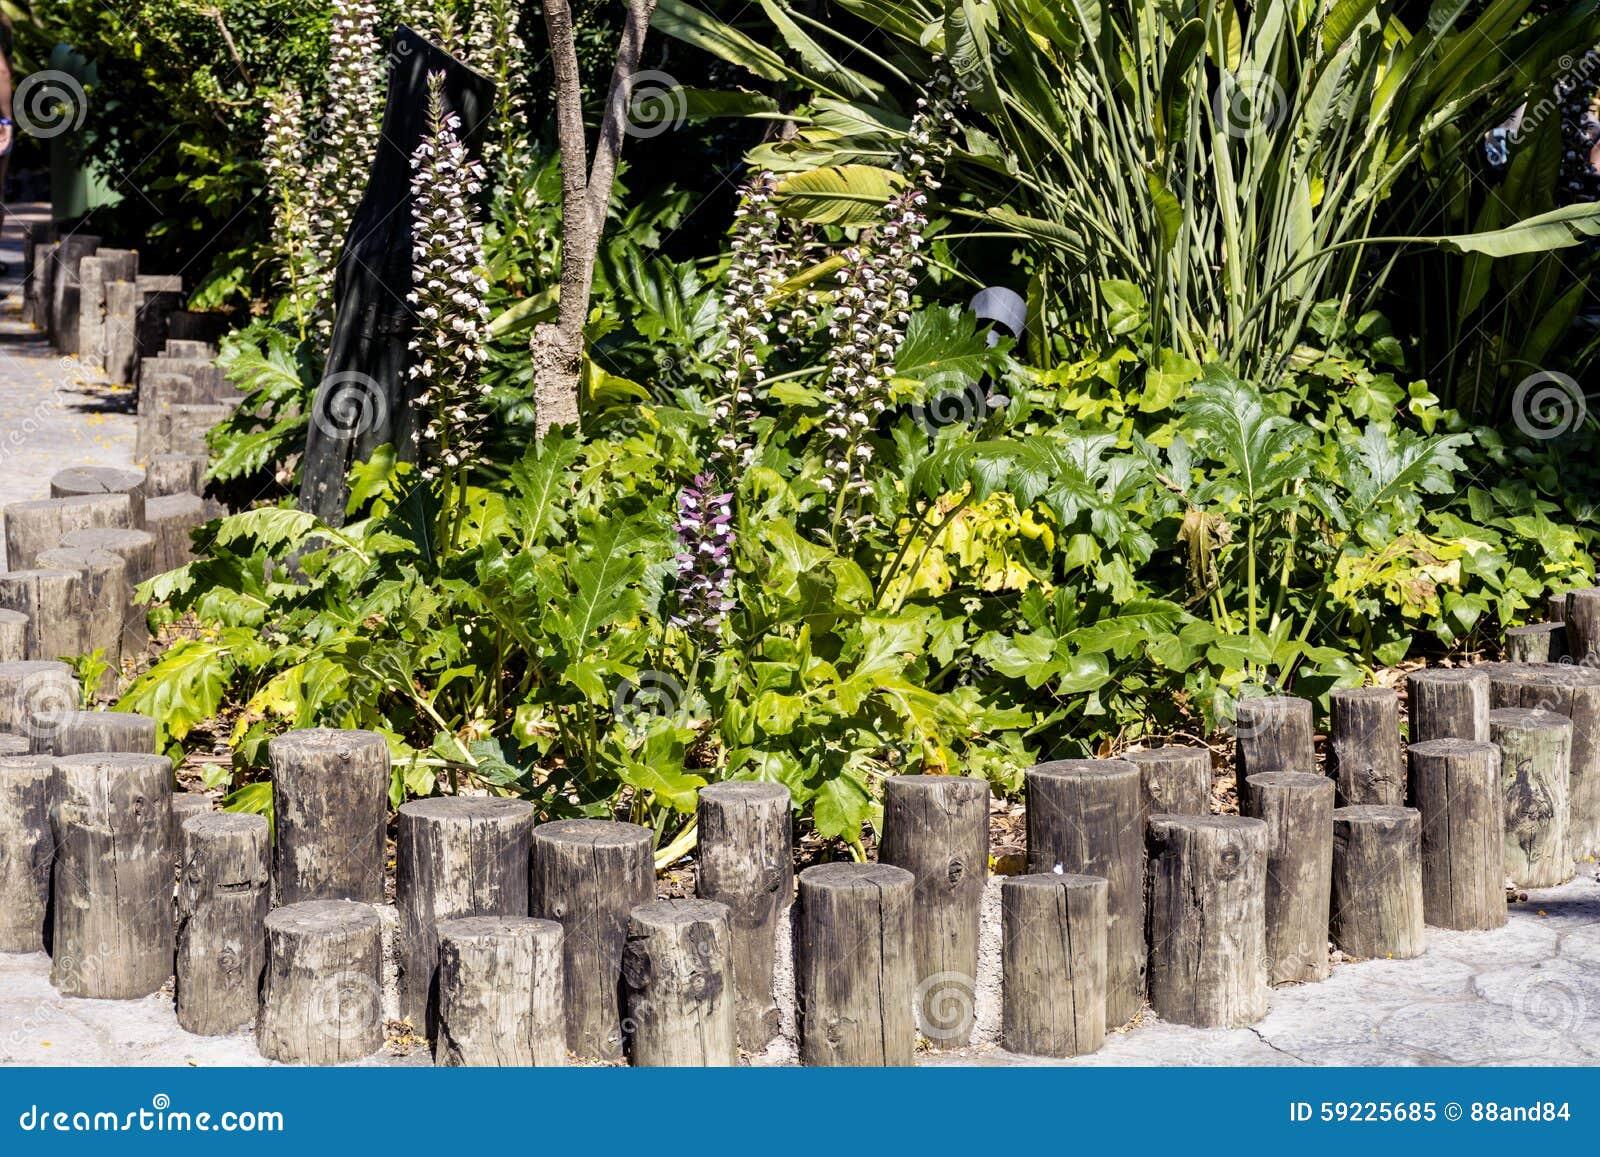 Download Palmas Verdes Al Aire Libre Imagen de archivo - Imagen de españa, exótico: 59225685